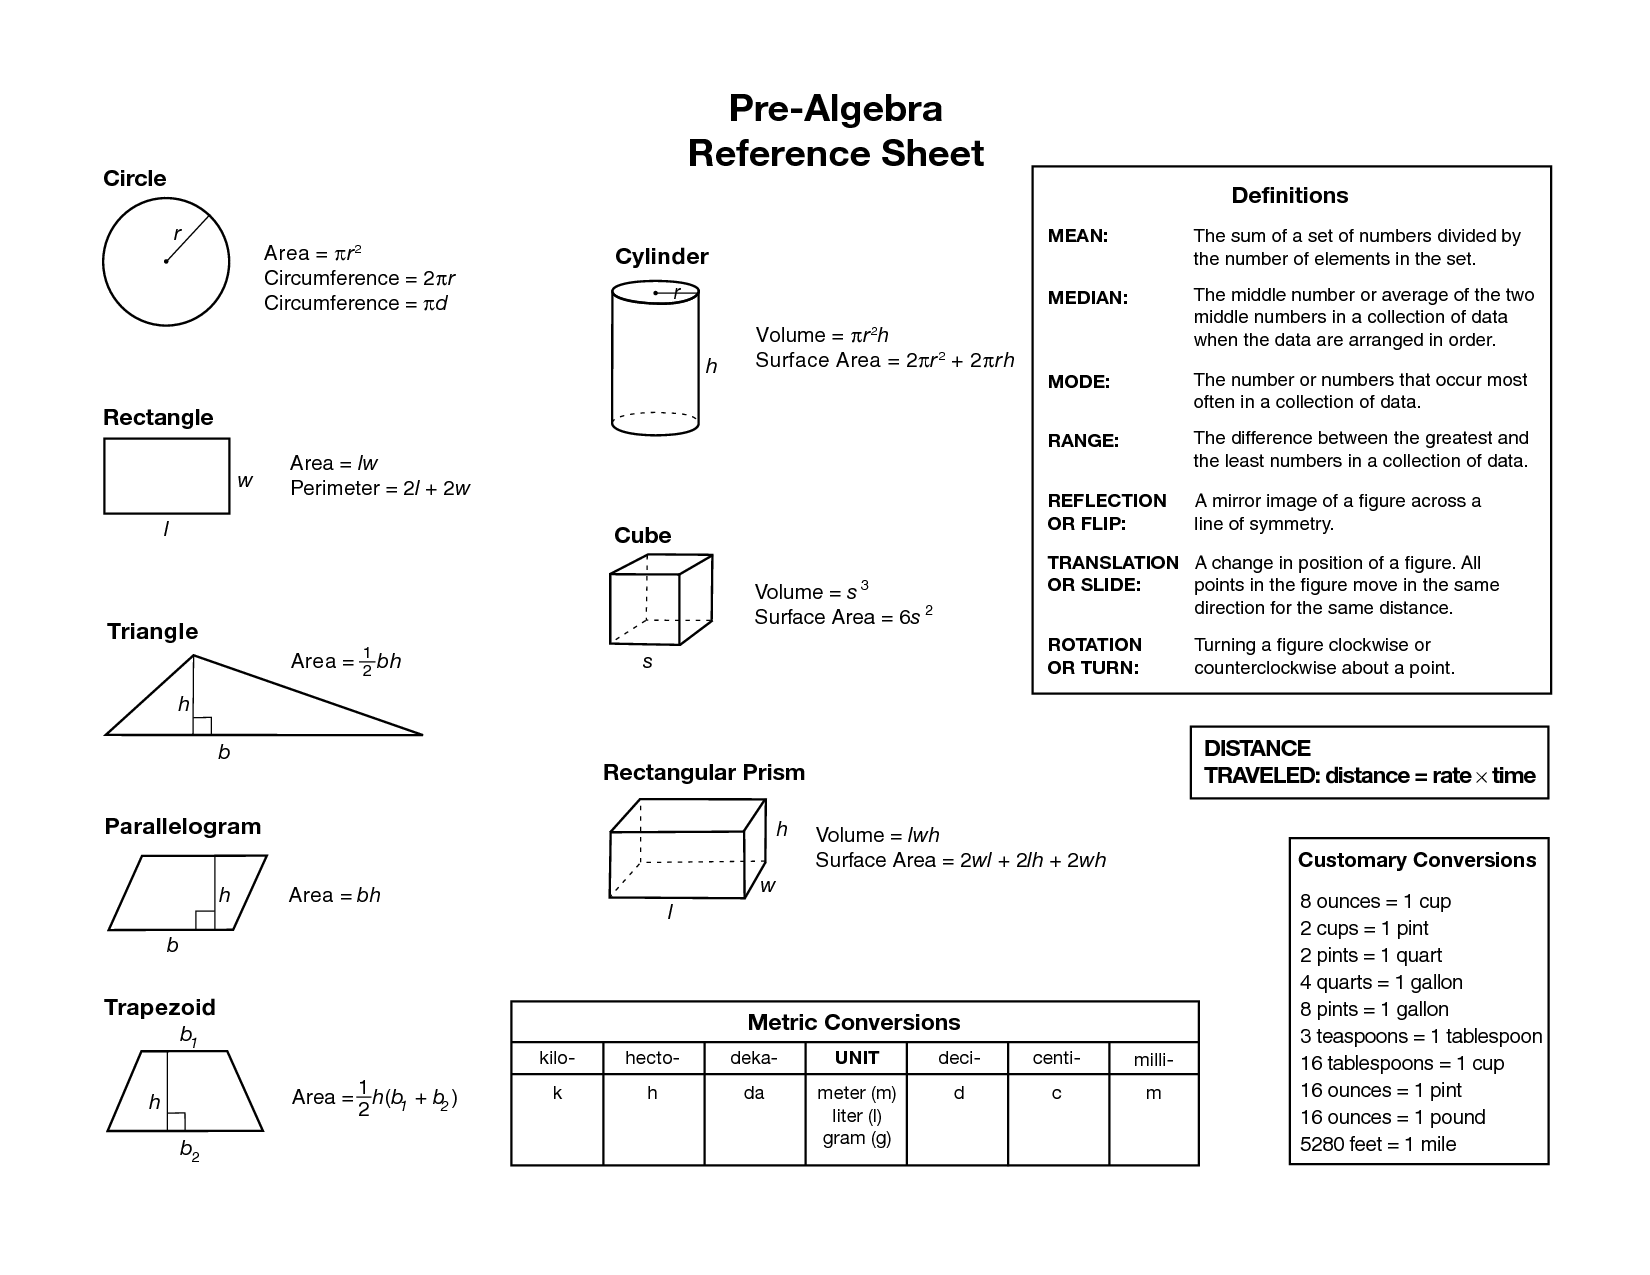 small resolution of Pre Algebra Reference Sheet   Pre algebra worksheets